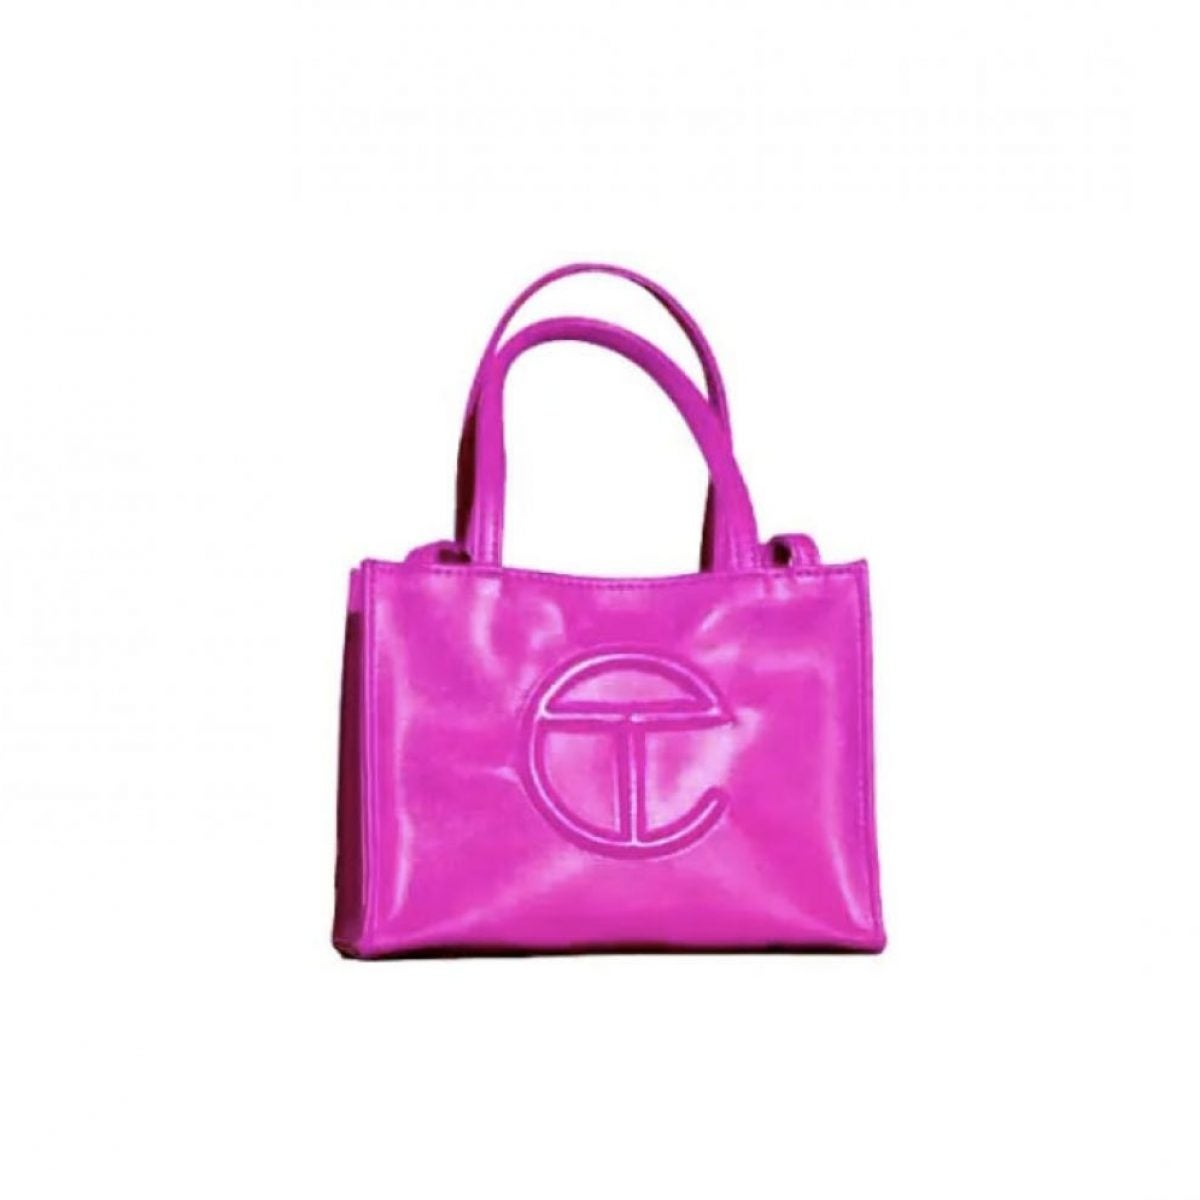 Telfar To Release New Bag In Azalea Pink